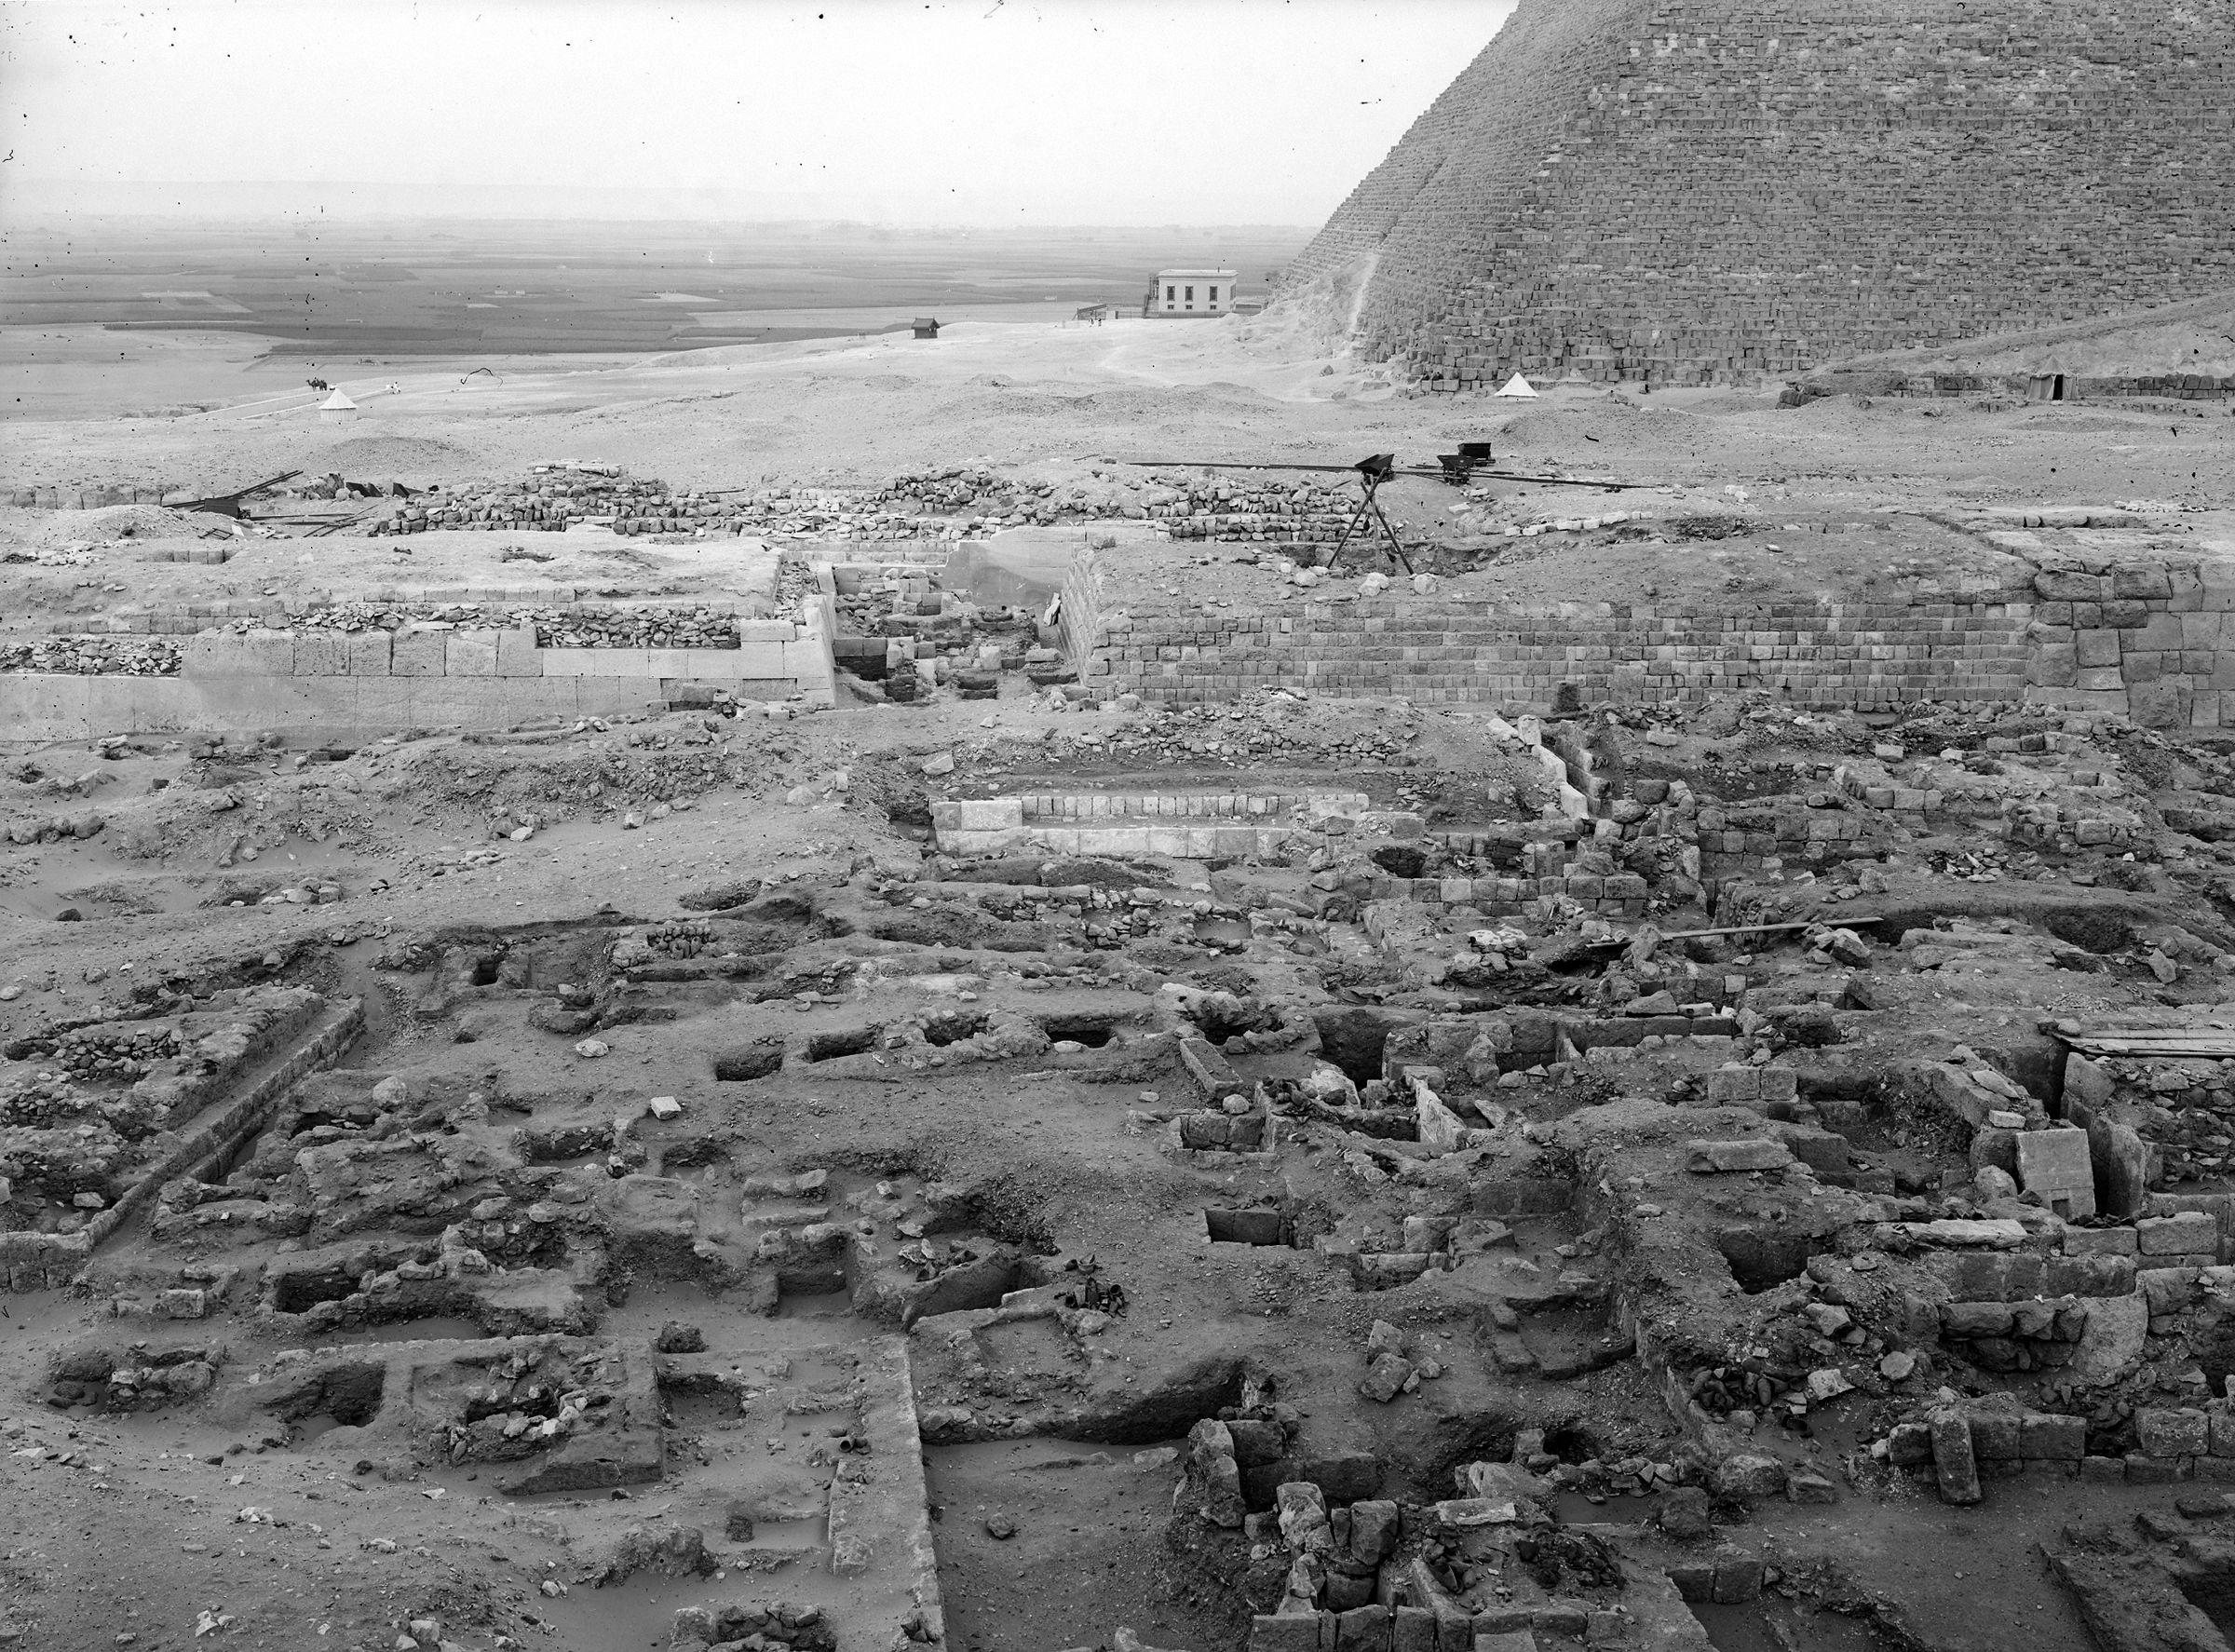 Western Cemetery: Site: Giza; View: G 2042, G 2043, G 2045, G 2046, G 2110, G 2100